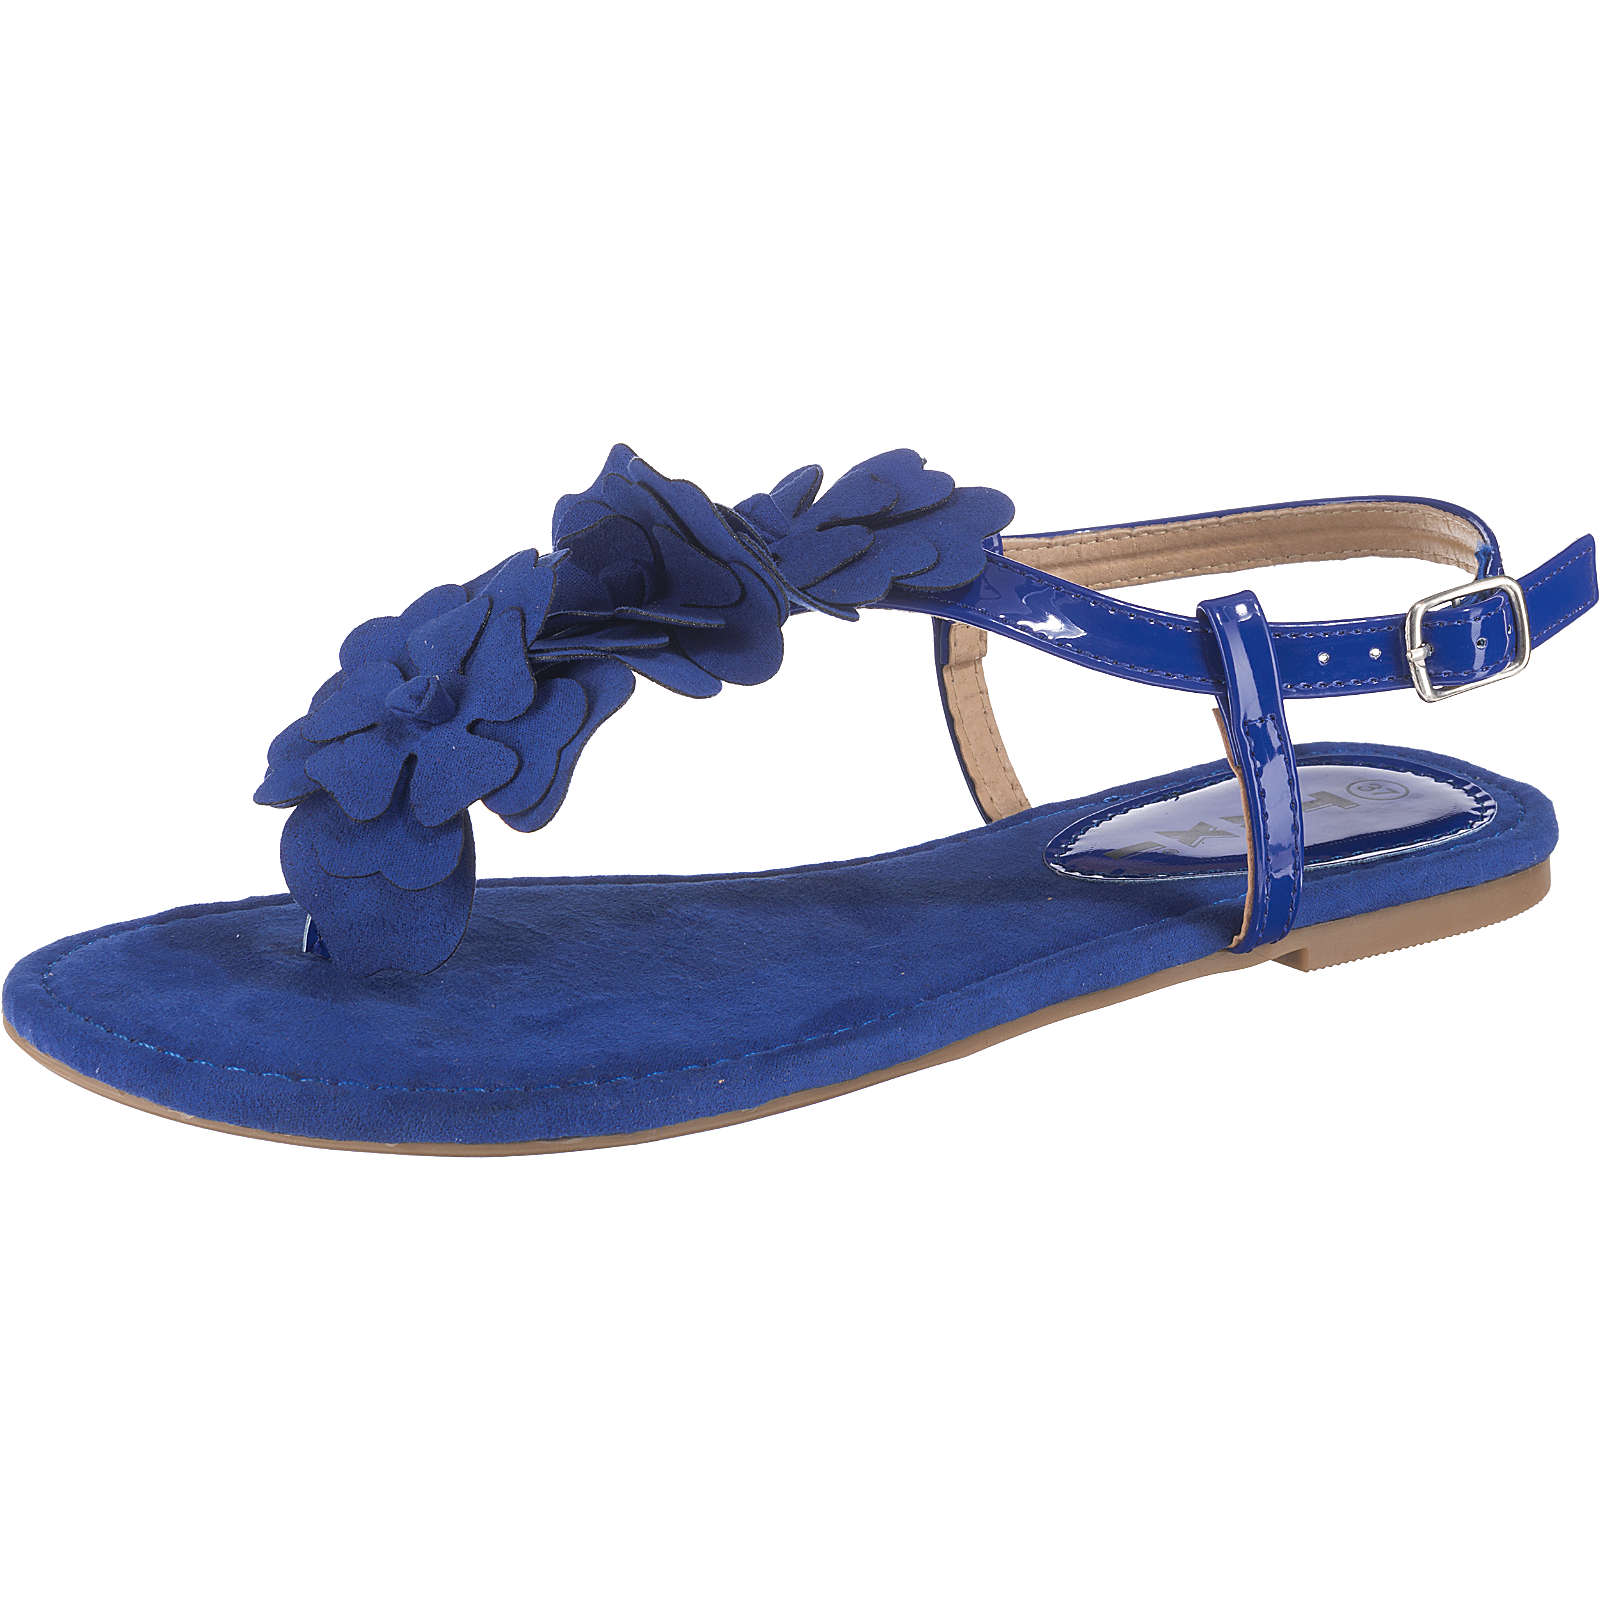 Taxi Shoes Riemchensandalen blau Damen Gr. 40